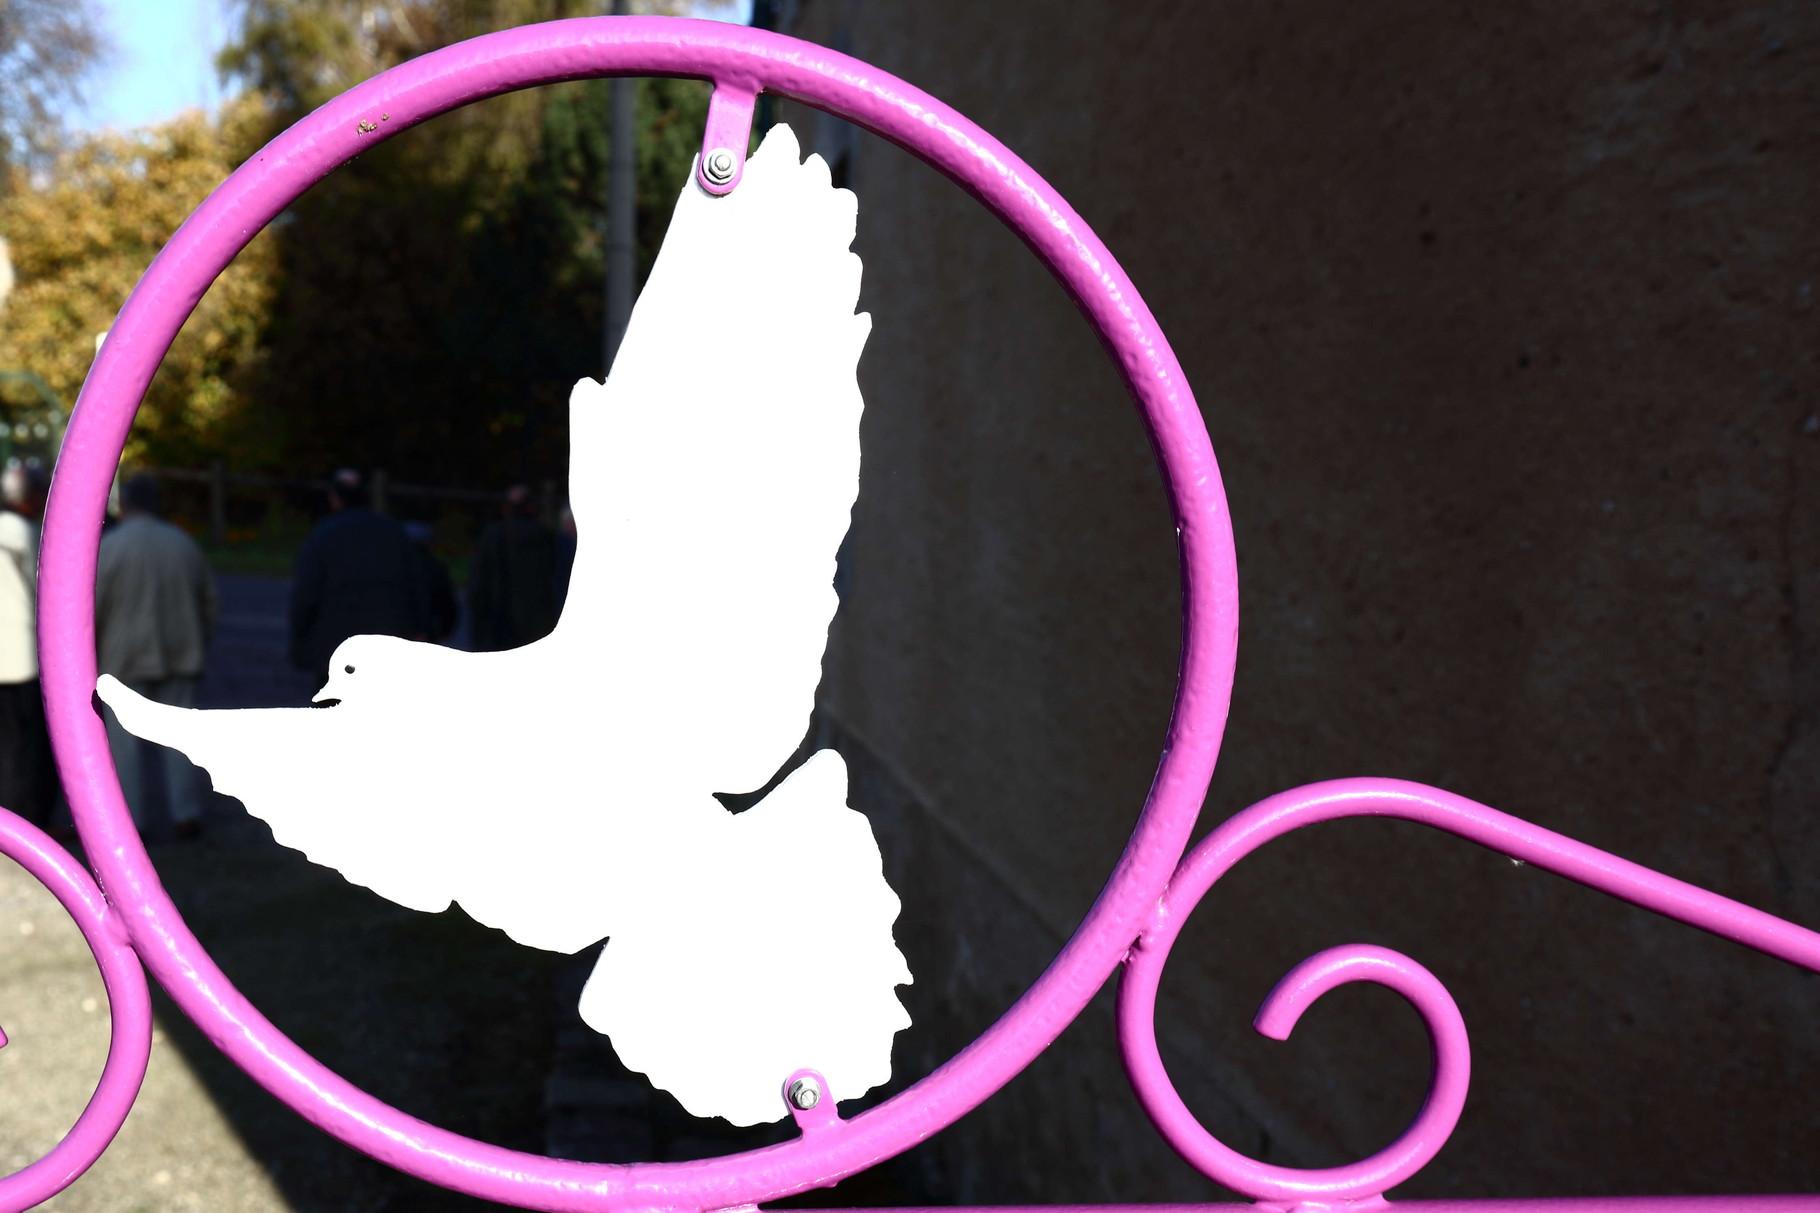 Das Tor zum Kirchhof - ein passendes Symbol zum 9. November